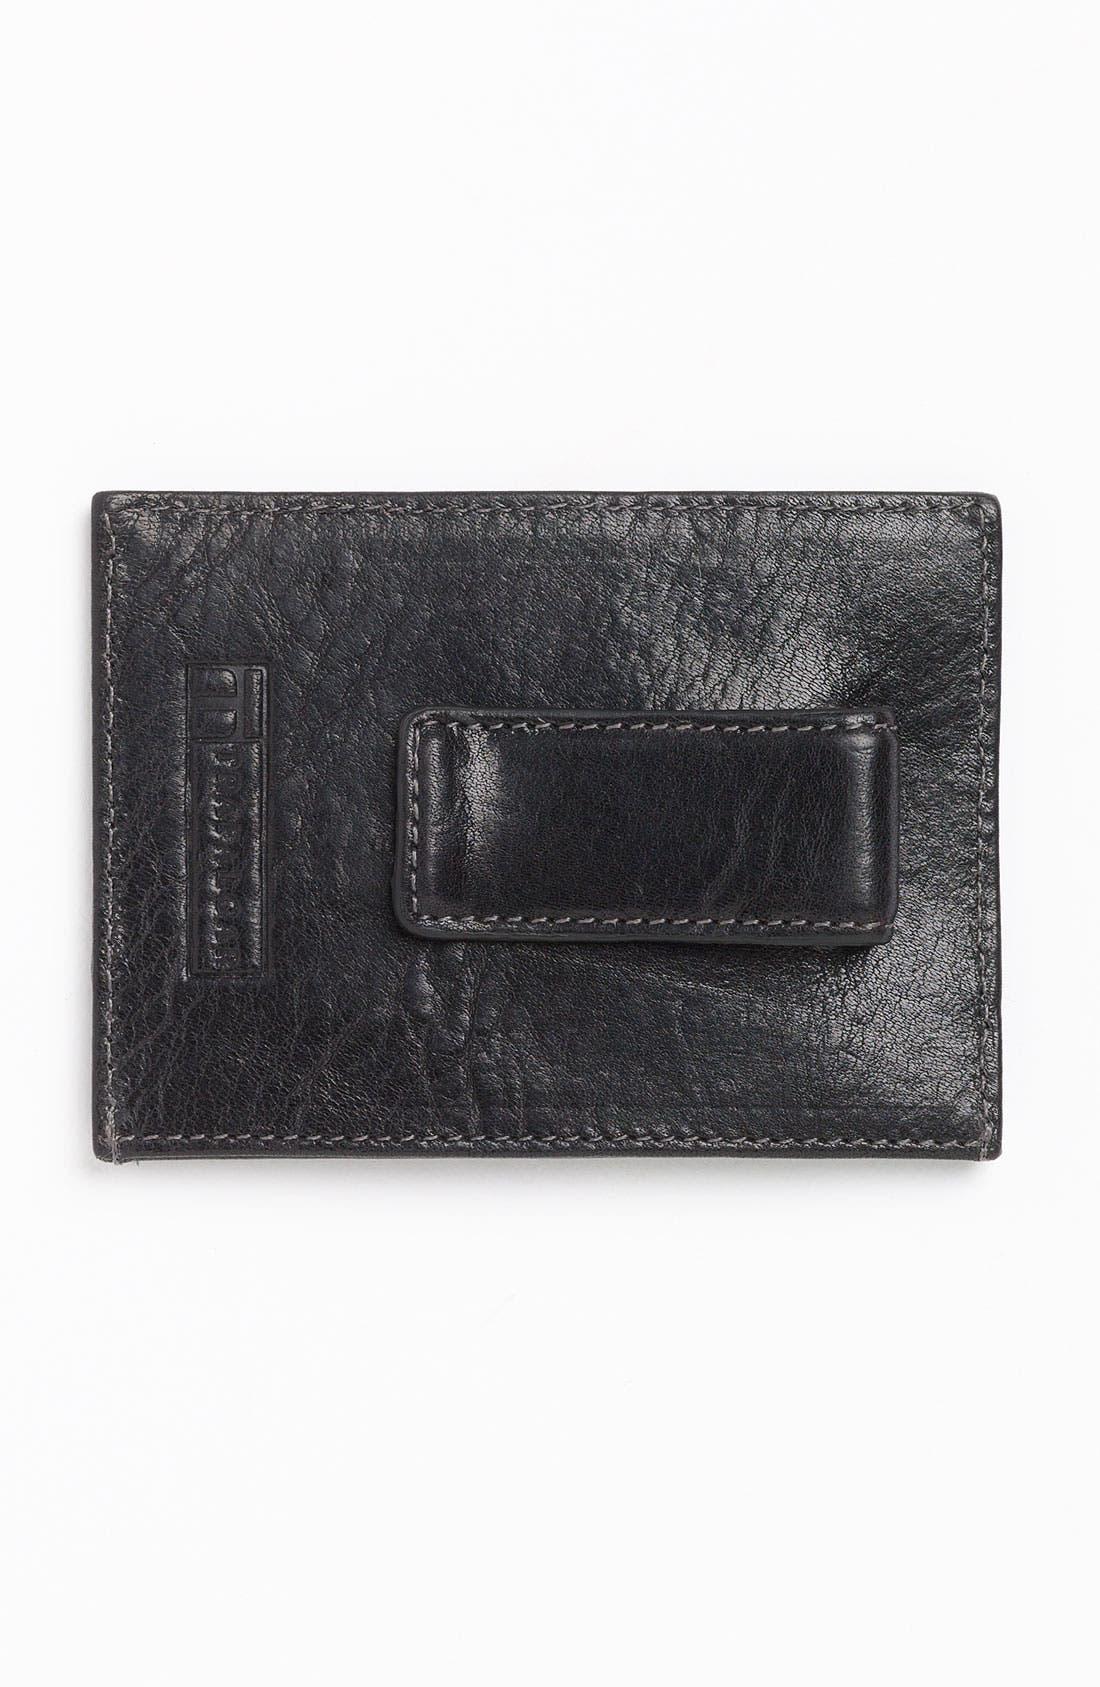 Main Image - Trafalgar 'Chesapeake' Money Clip Wallet